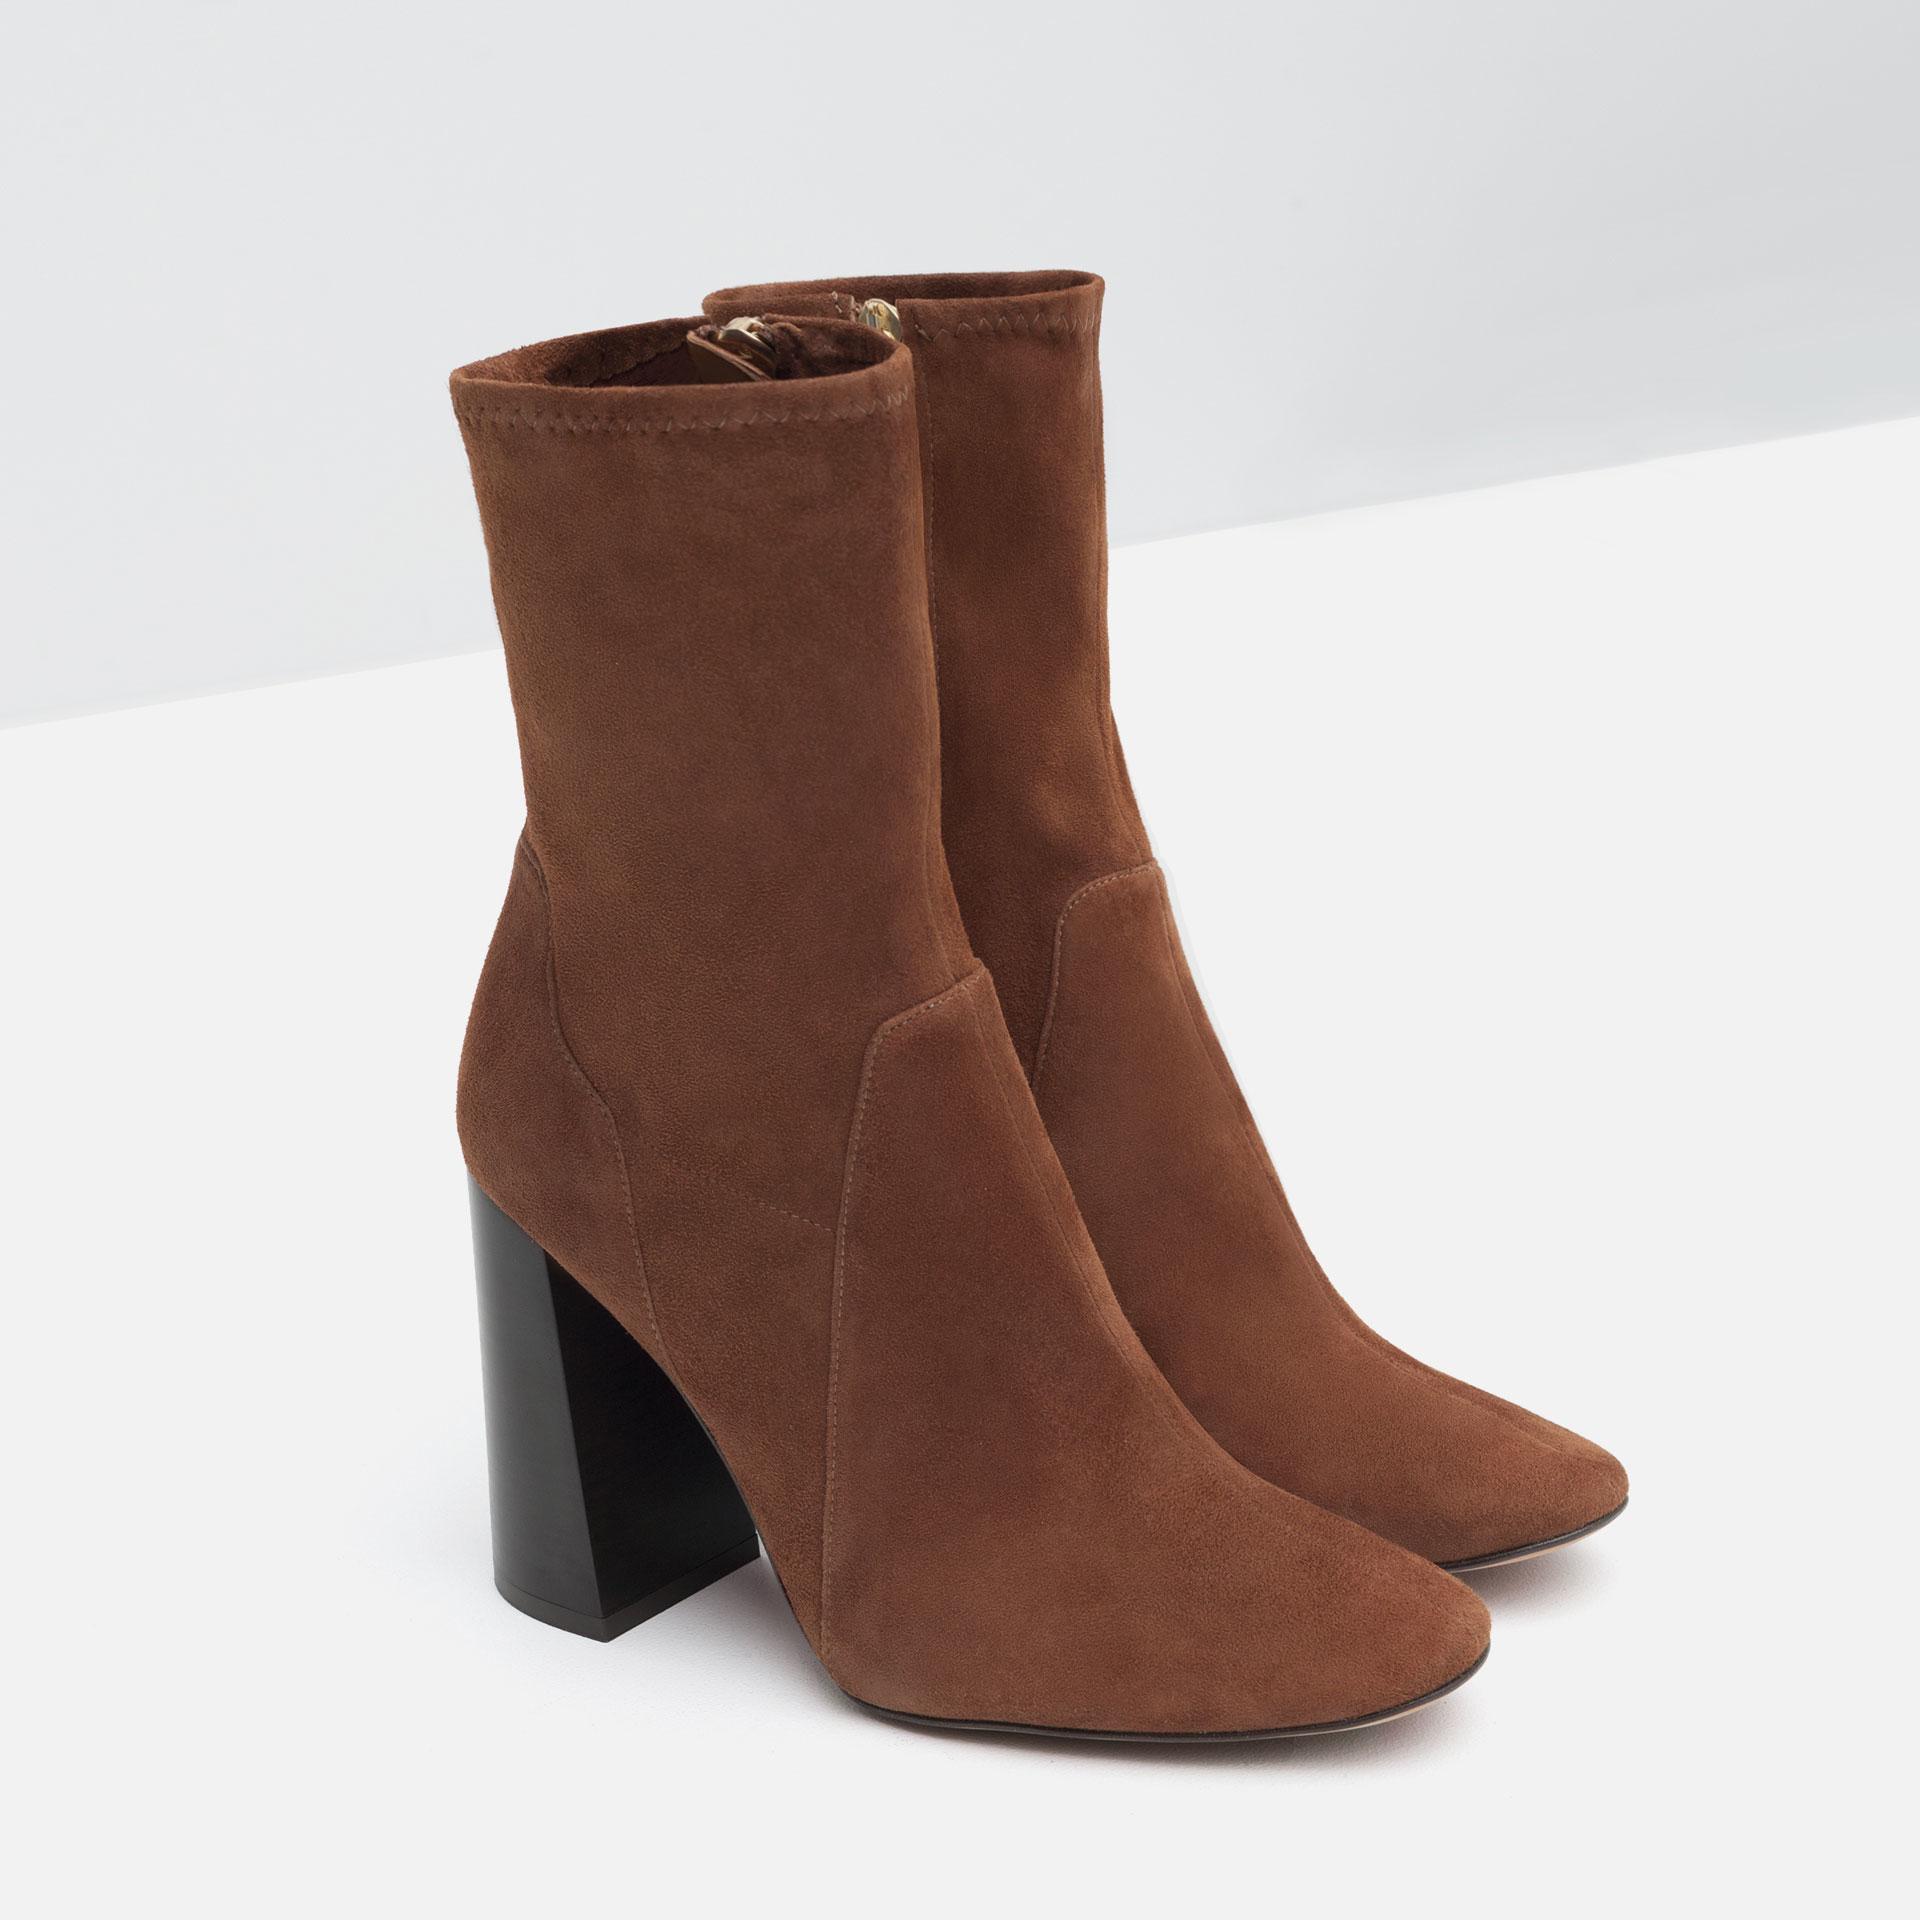 zara high heel suede ankle boots in brown lyst. Black Bedroom Furniture Sets. Home Design Ideas